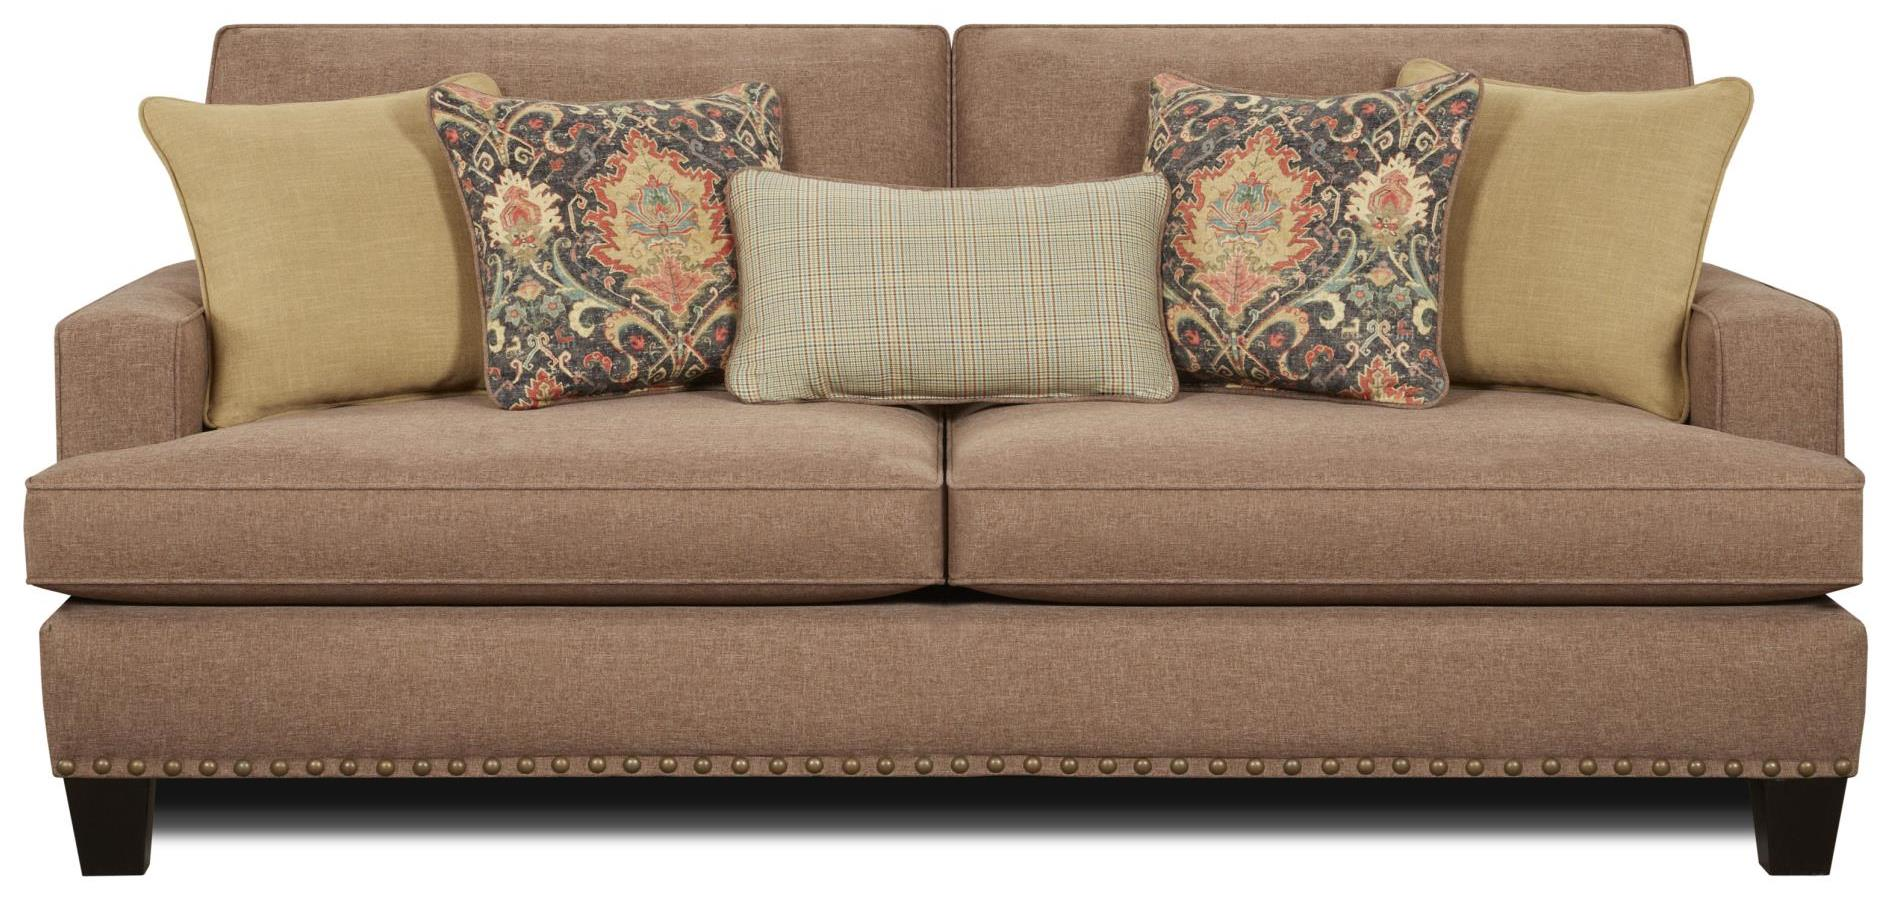 Fusion Furniture Monroe Sofa - Item Number: 2470-KPMaxwell Pecan